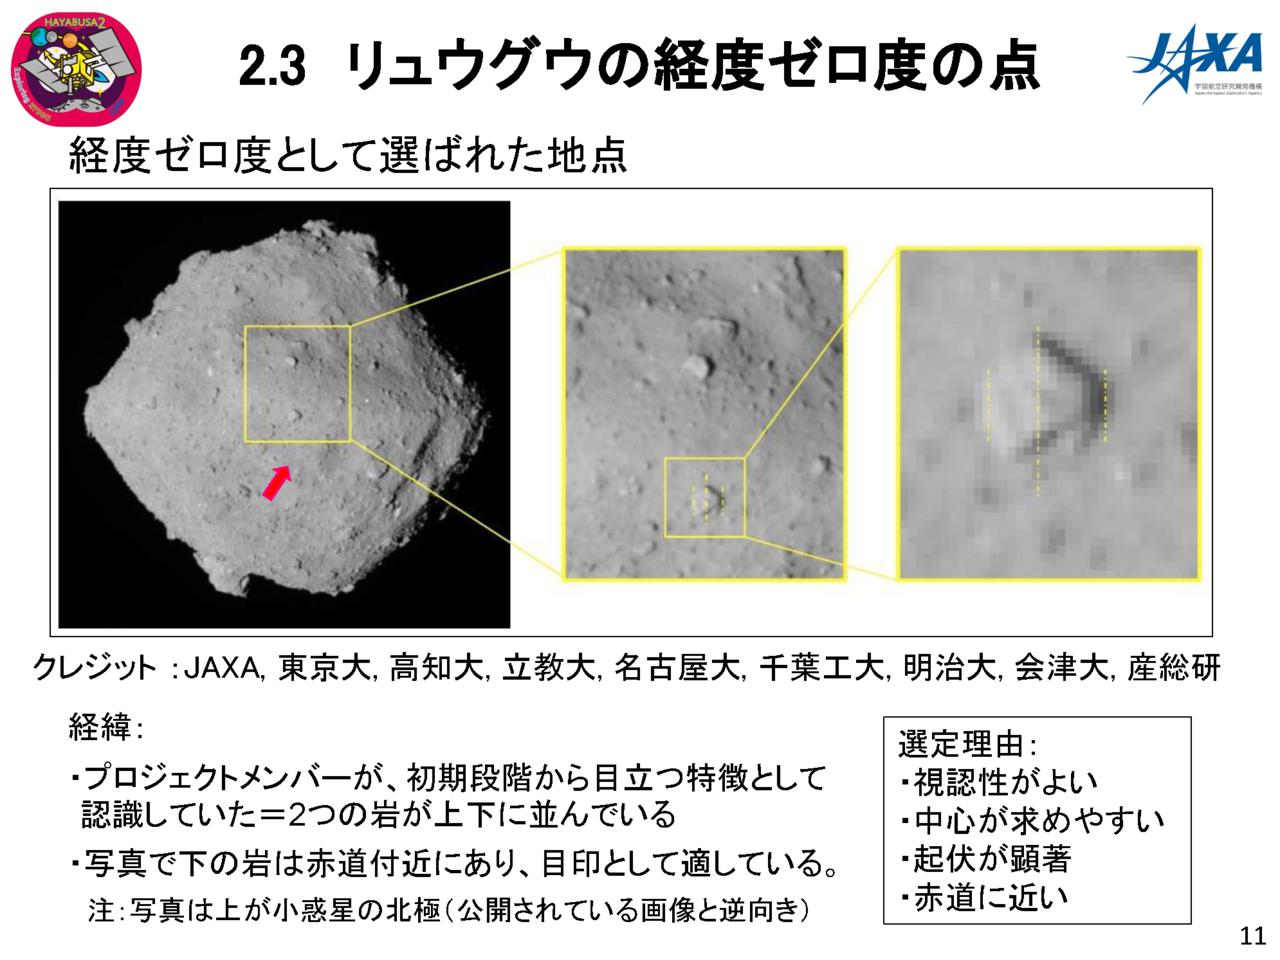 f:id:Imamura:20180719131706p:plain